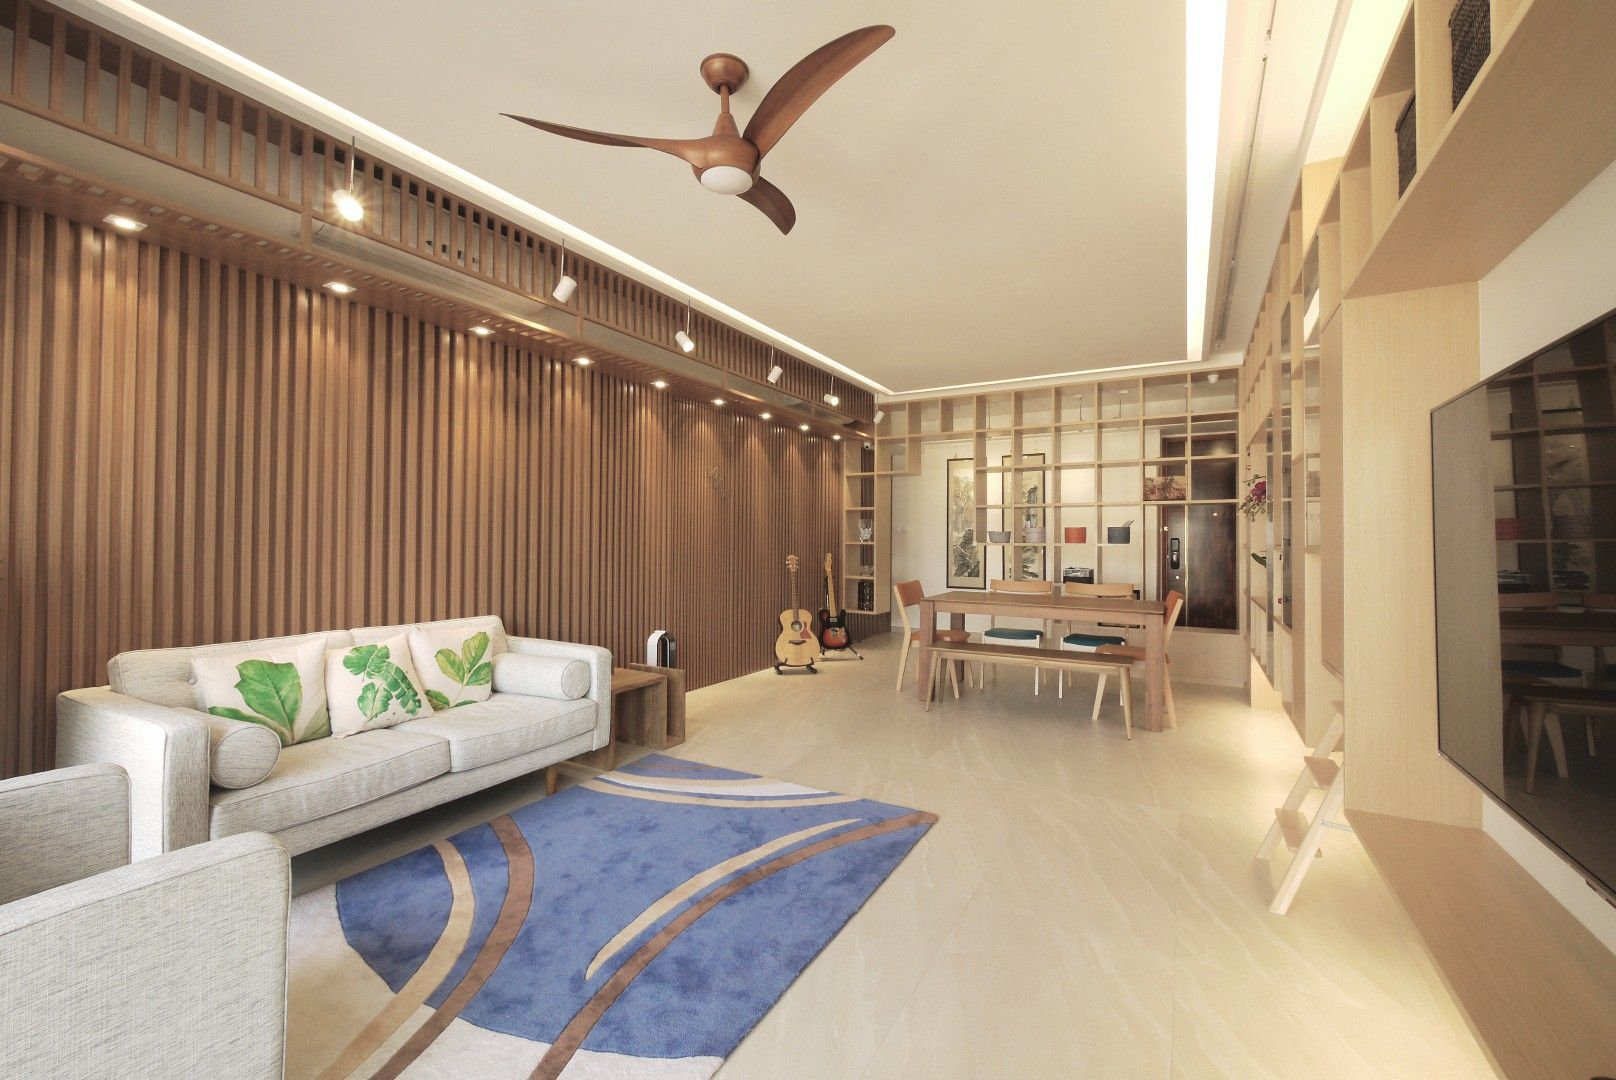 Small design ideas residential interior design hong kong interior designer find the best